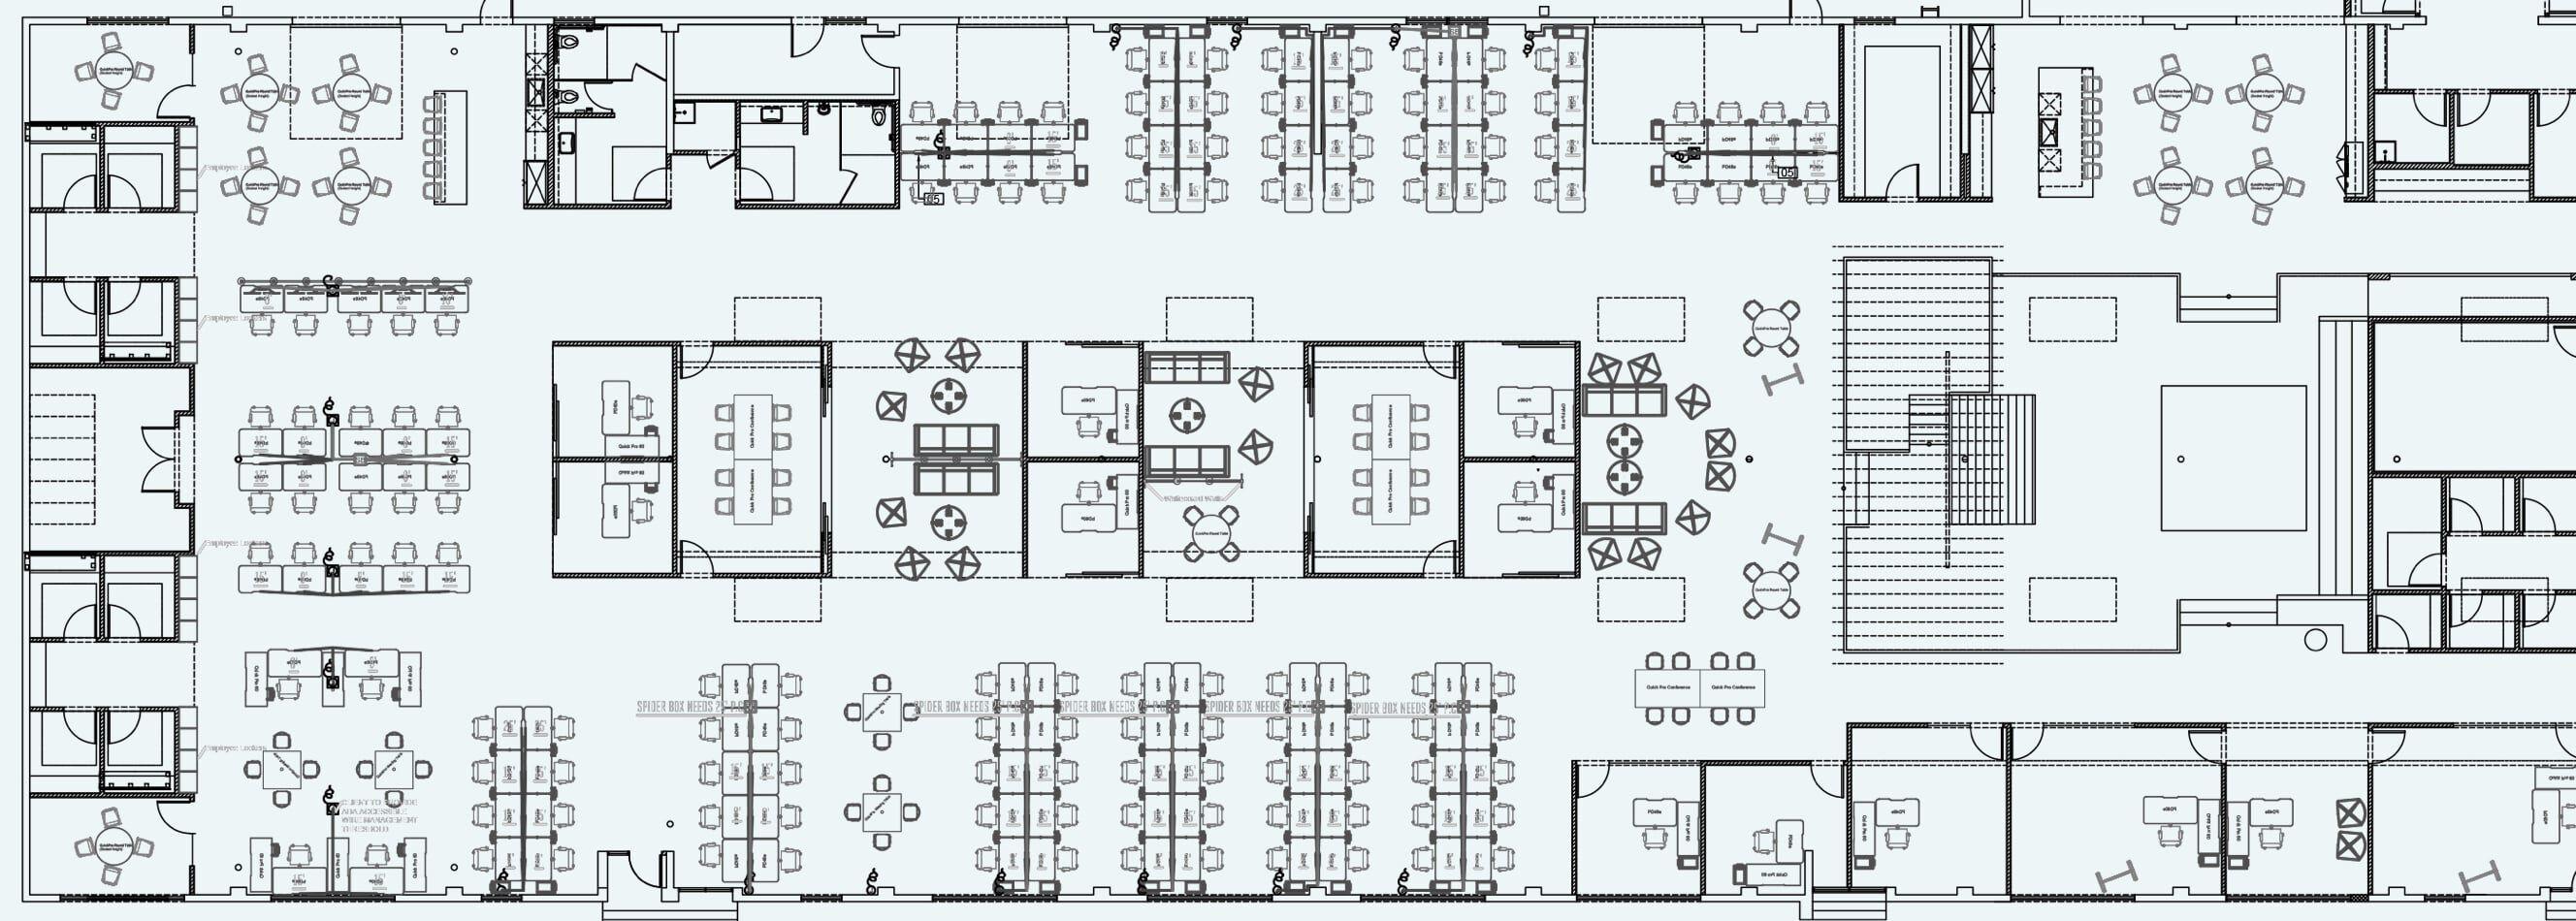 floor plan for hawke media space  image